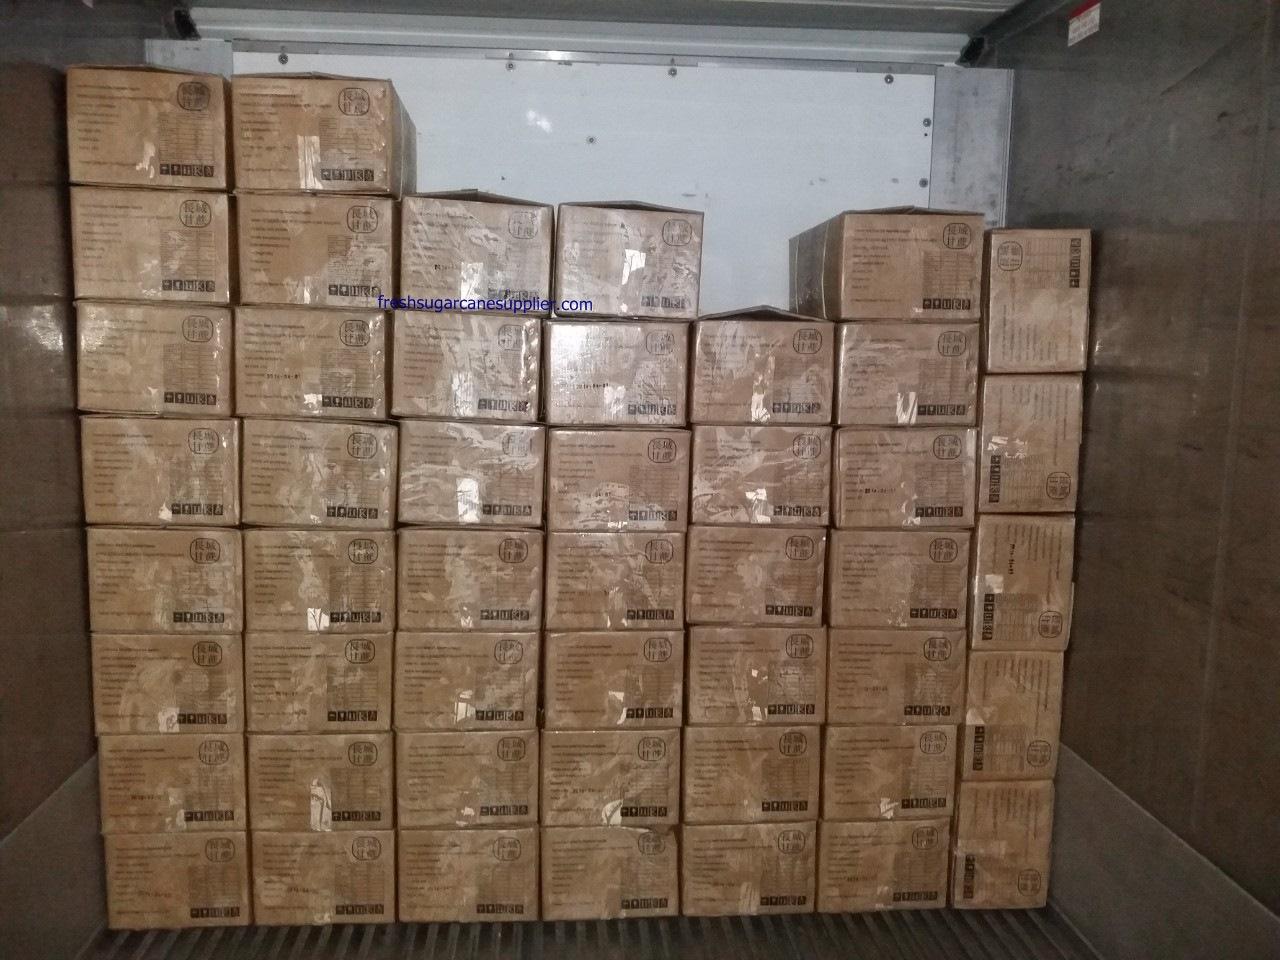 Sugarcane wholesales